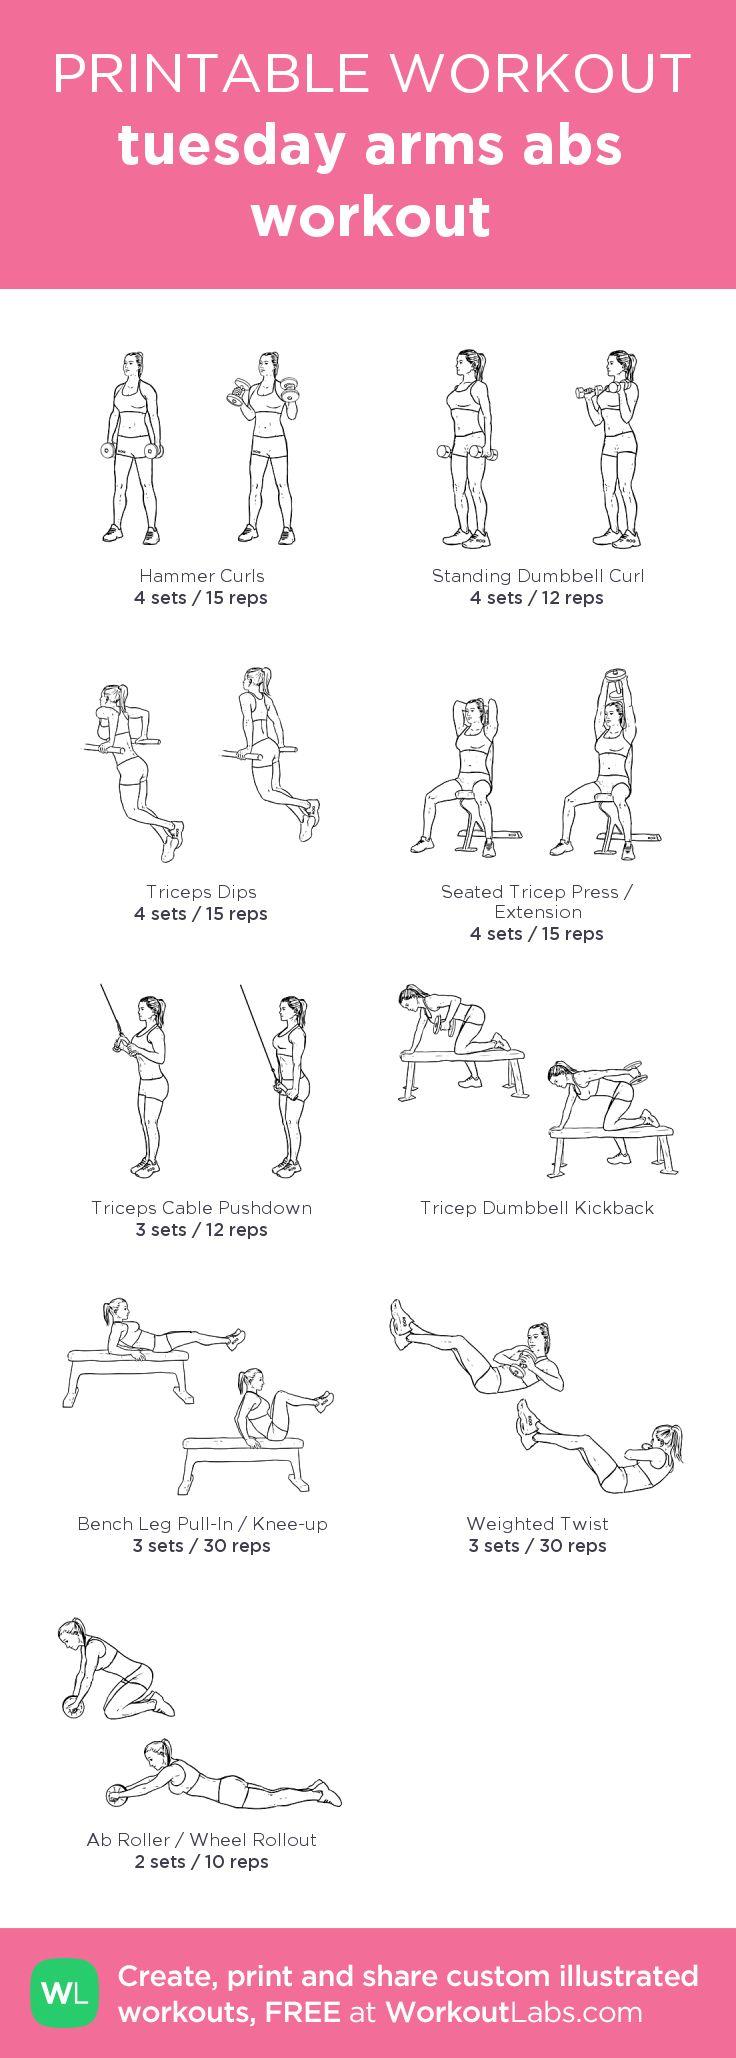 tuesday arms abs workout:my custom printable workout by @WorkoutLabs #workoutlabs #customworkout